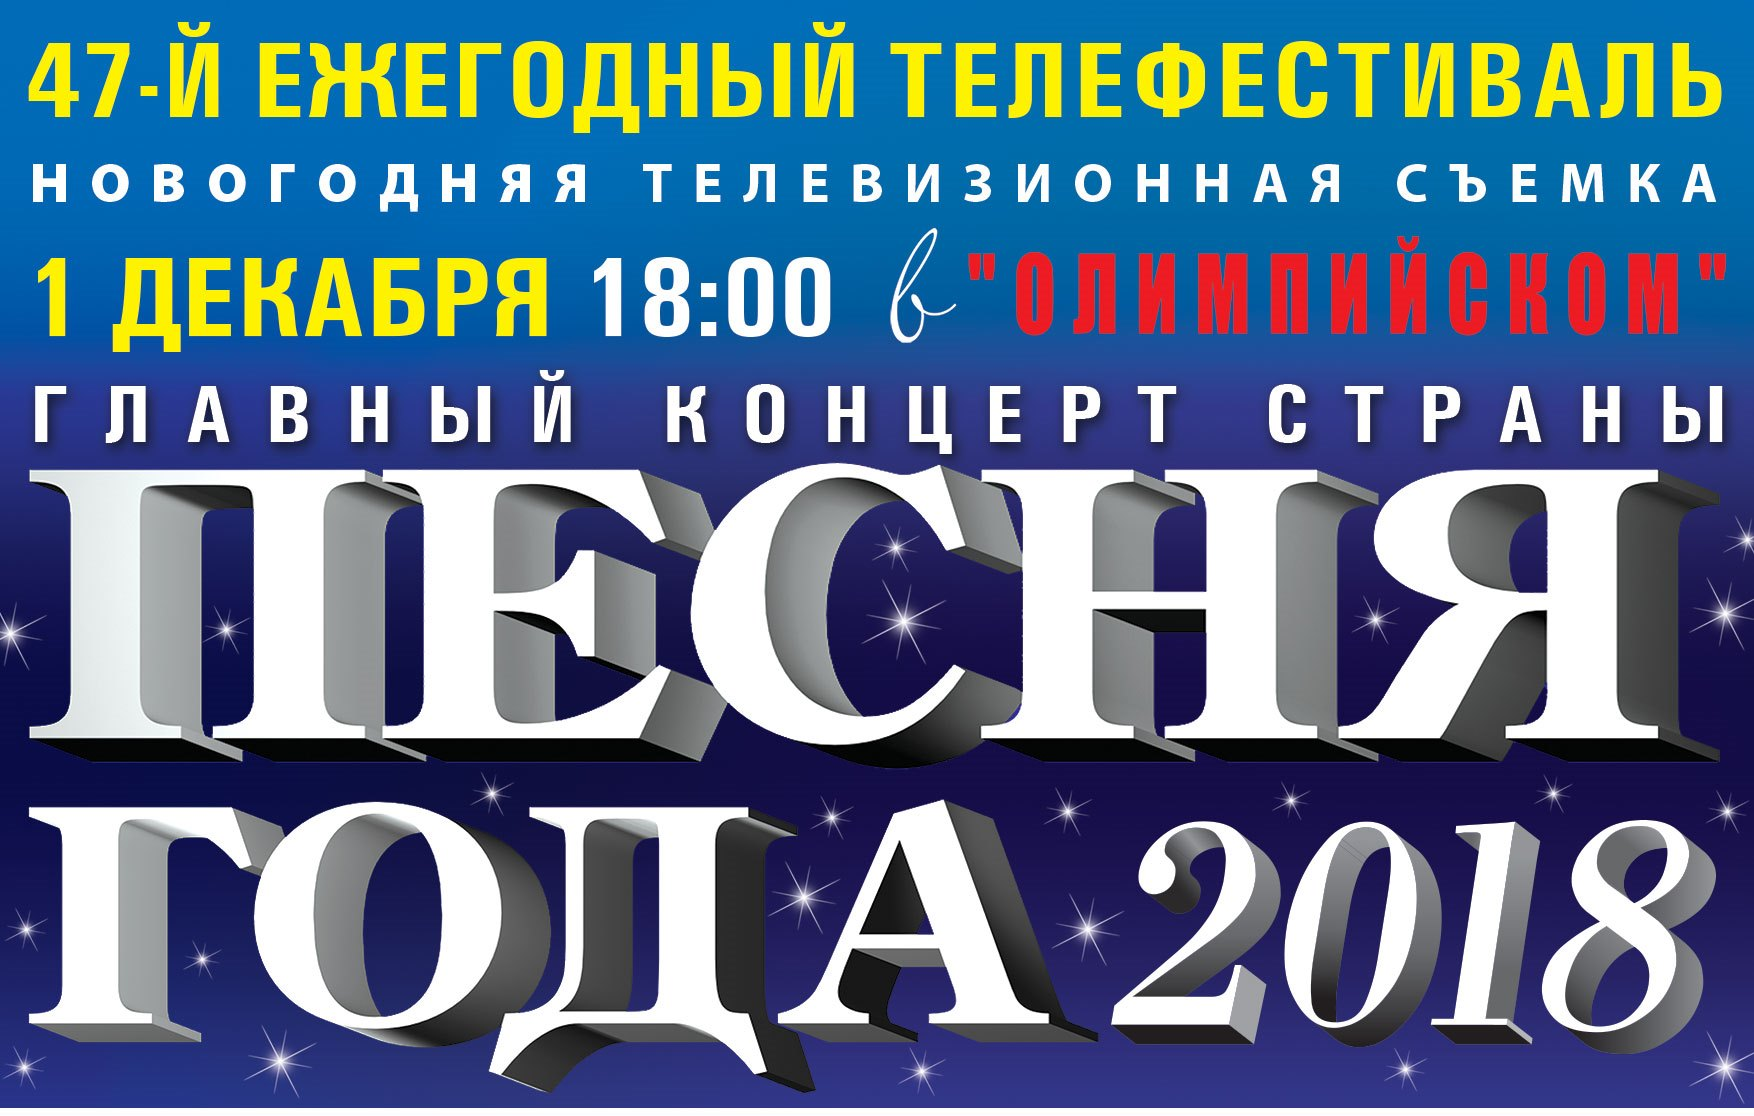 _letuchka_A4_без-лого_2018.jpg